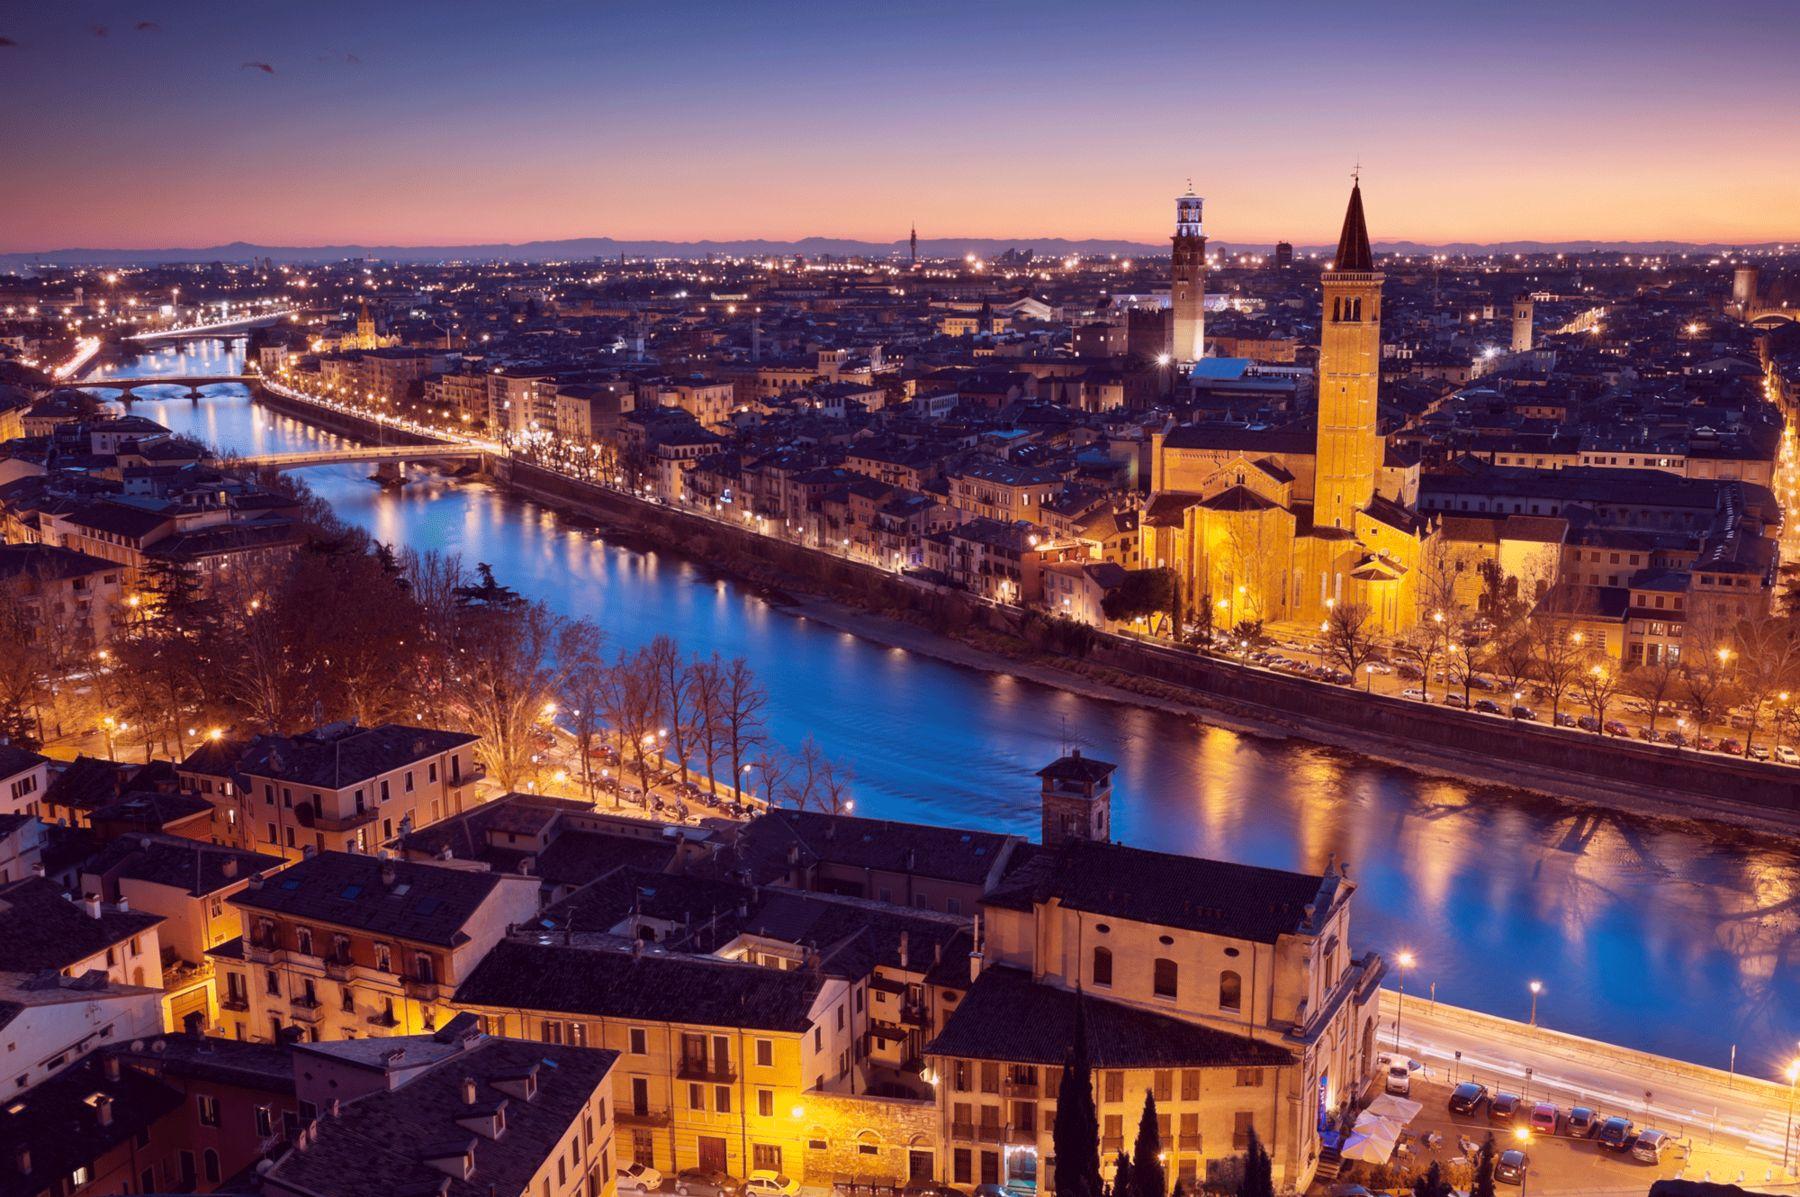 Verona iStock18993680 web